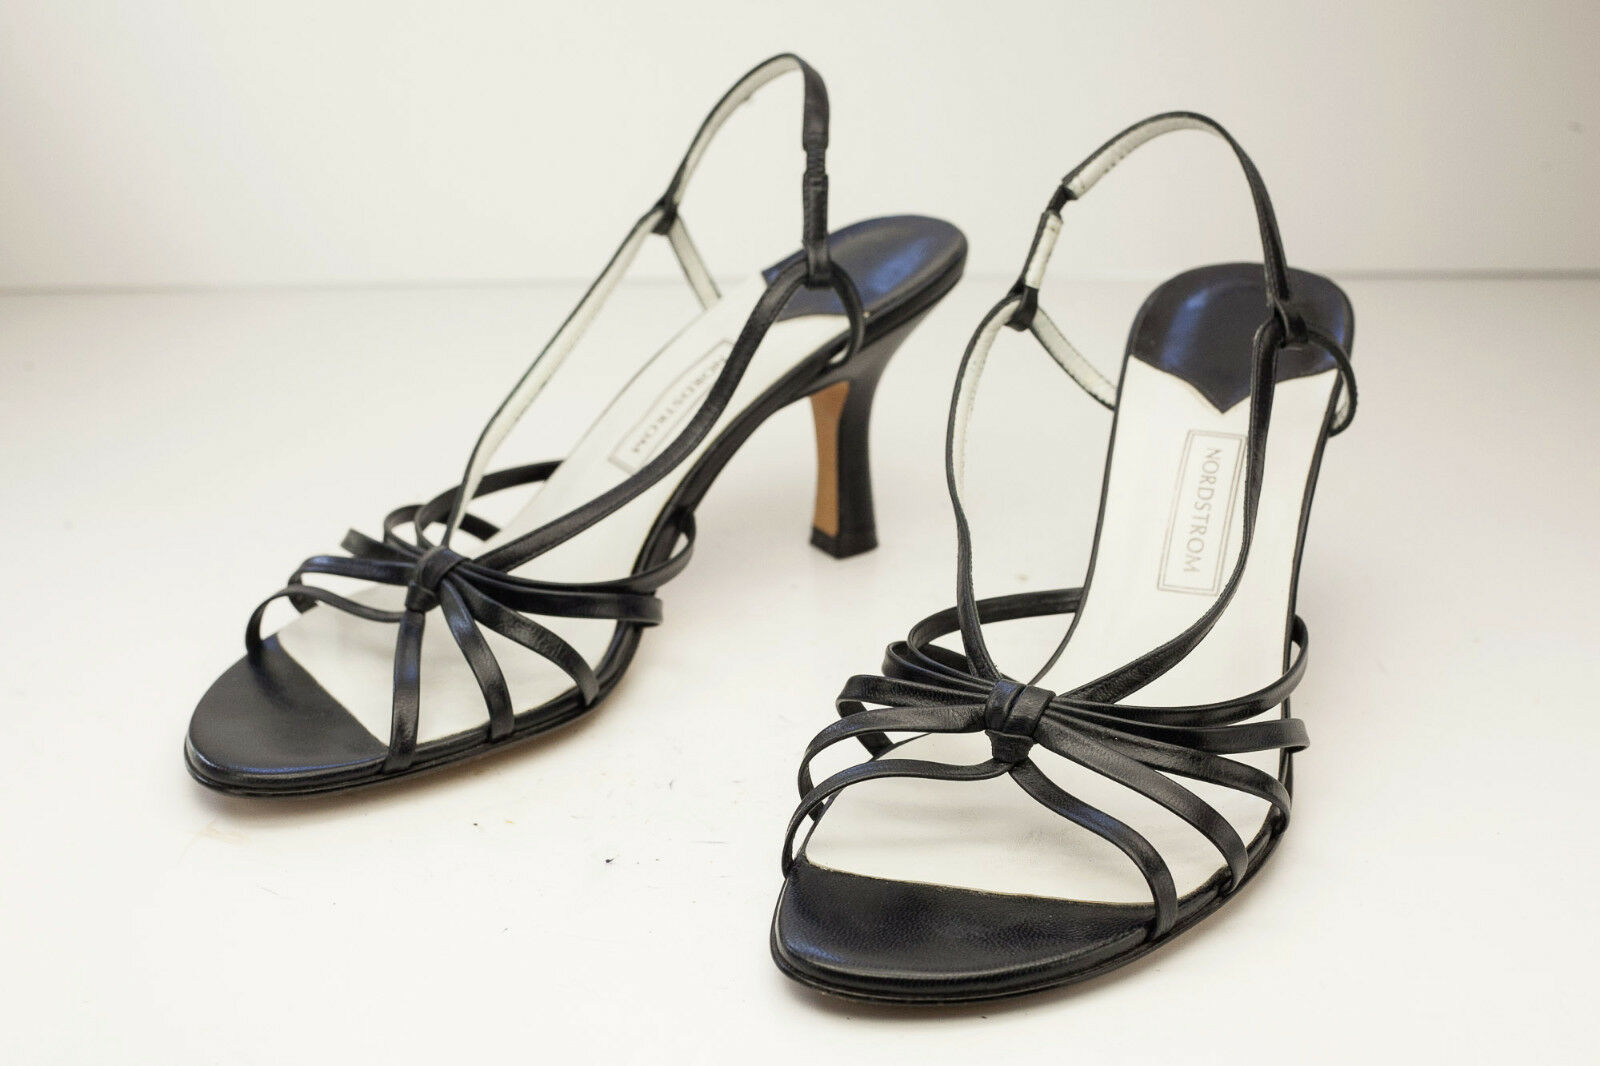 Nordstrom 8.5 Black Strappy Dress Sandal Women's